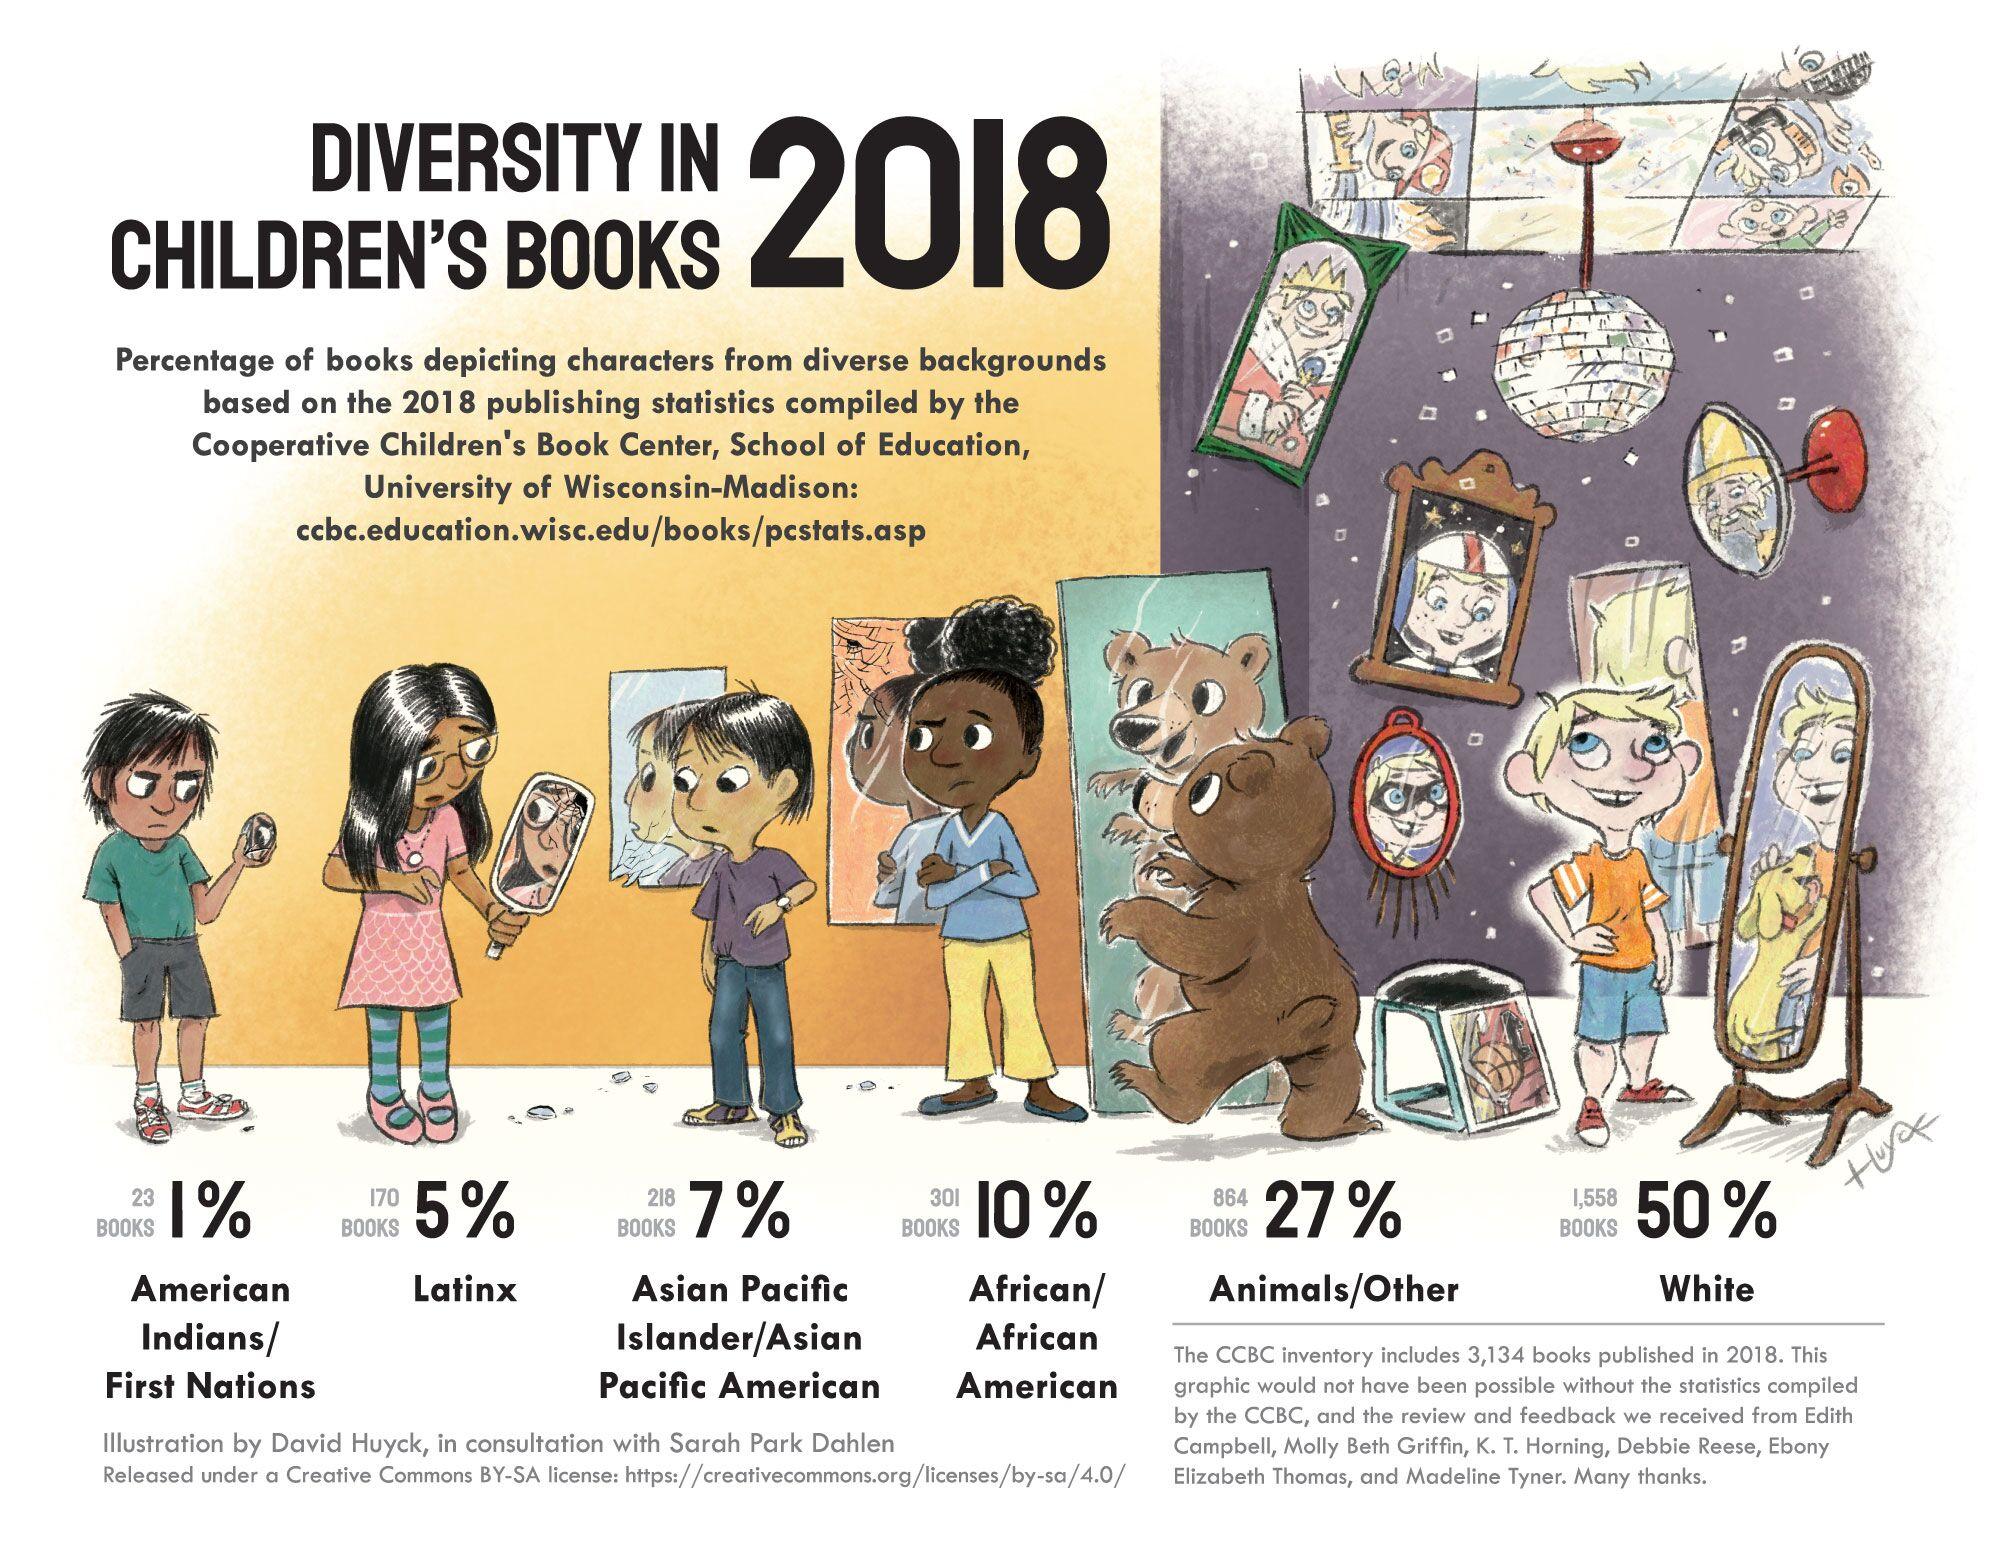 Diversity in Children's Books 2018 Infographic | OYAN